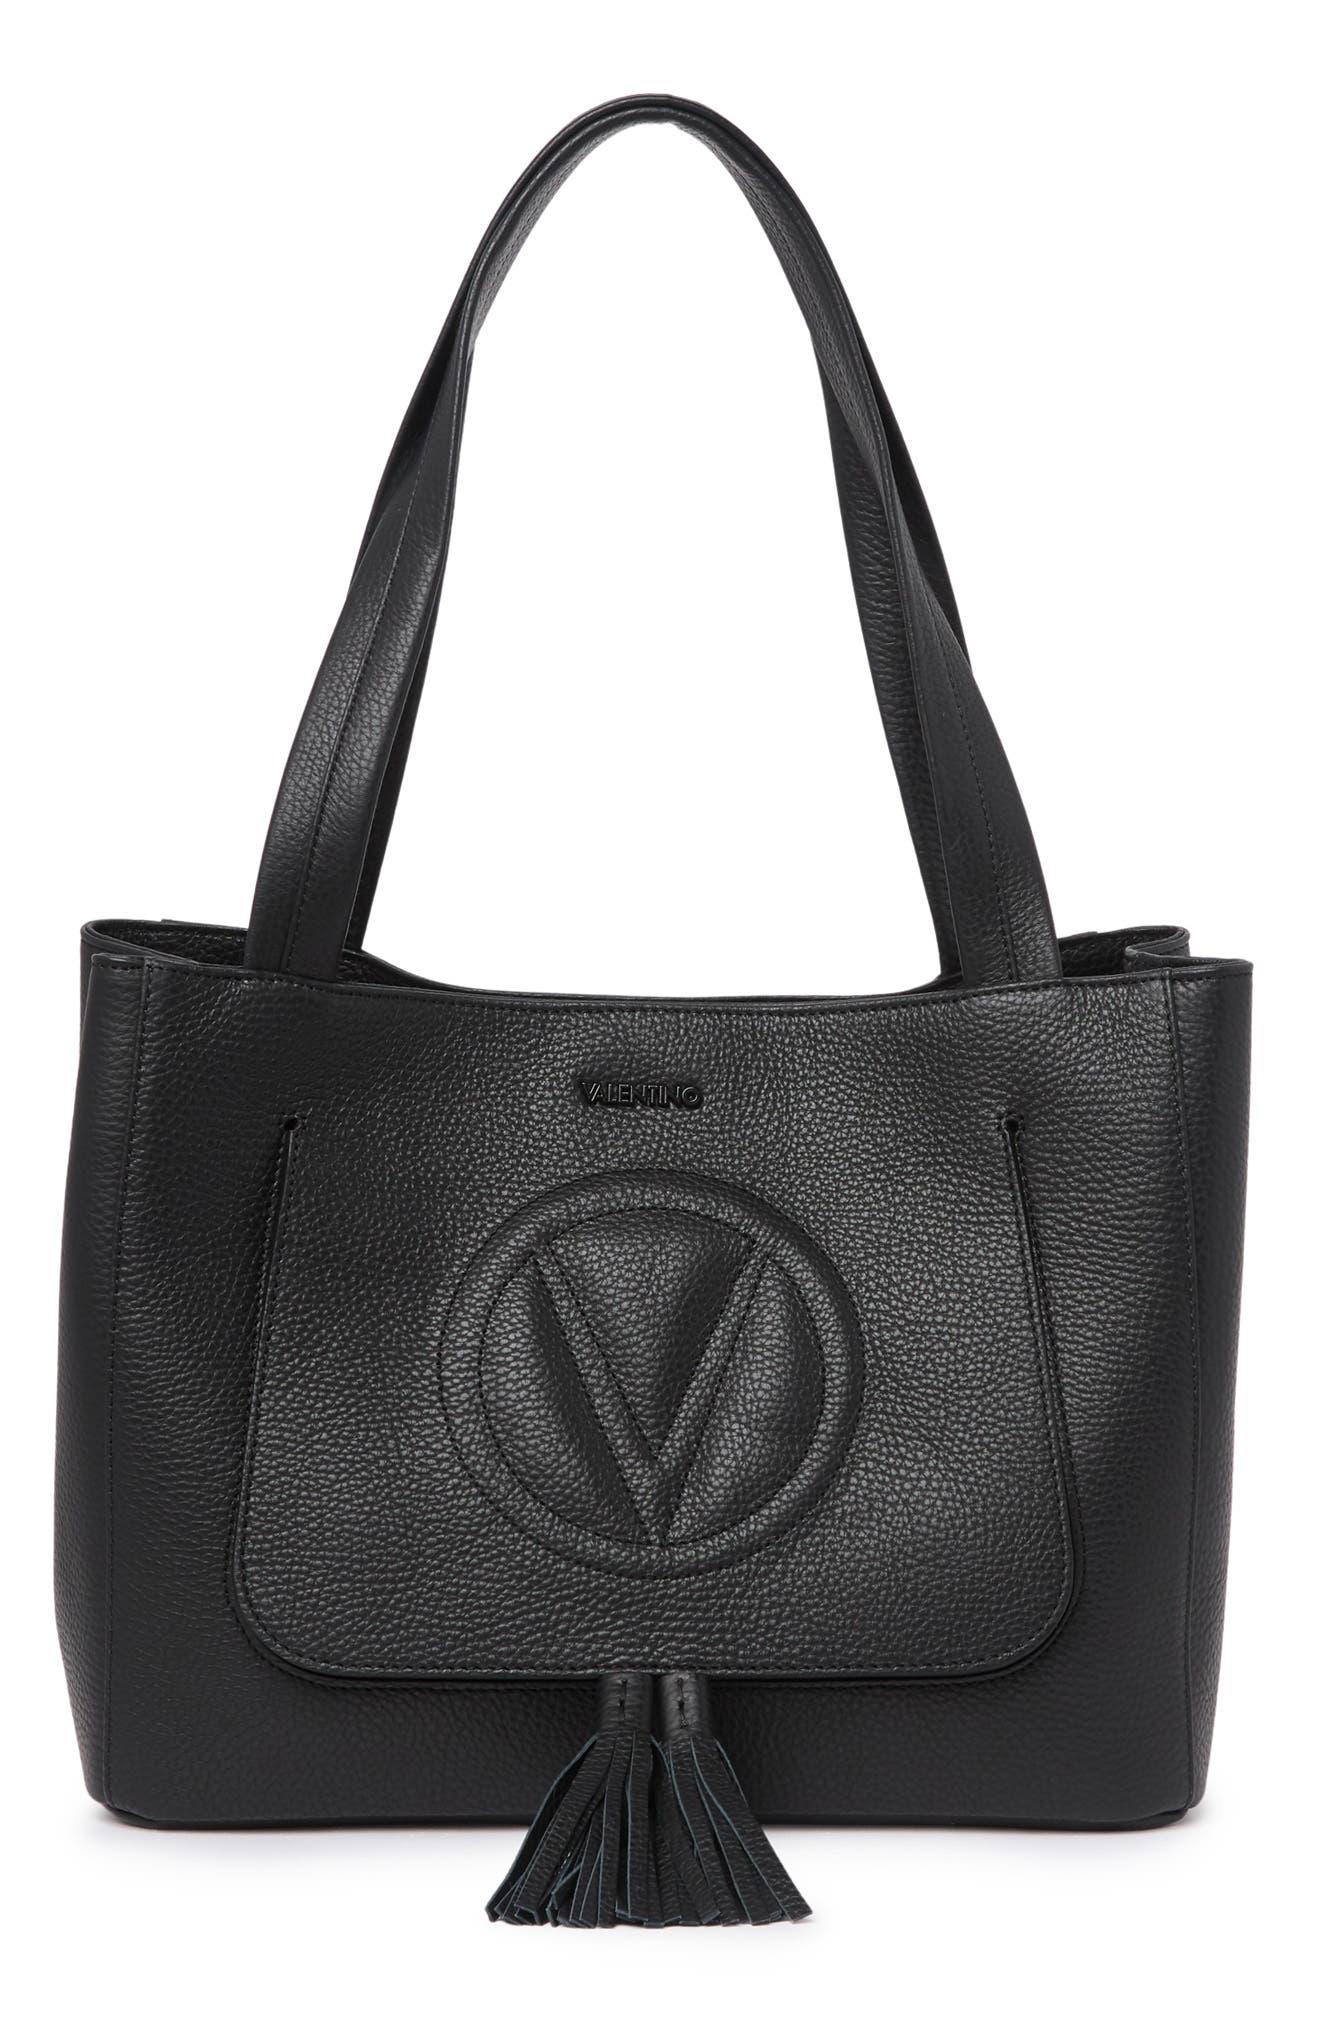 Image of Valentino By Mario Valentino Estelle Dollaro Leather Tote Bag